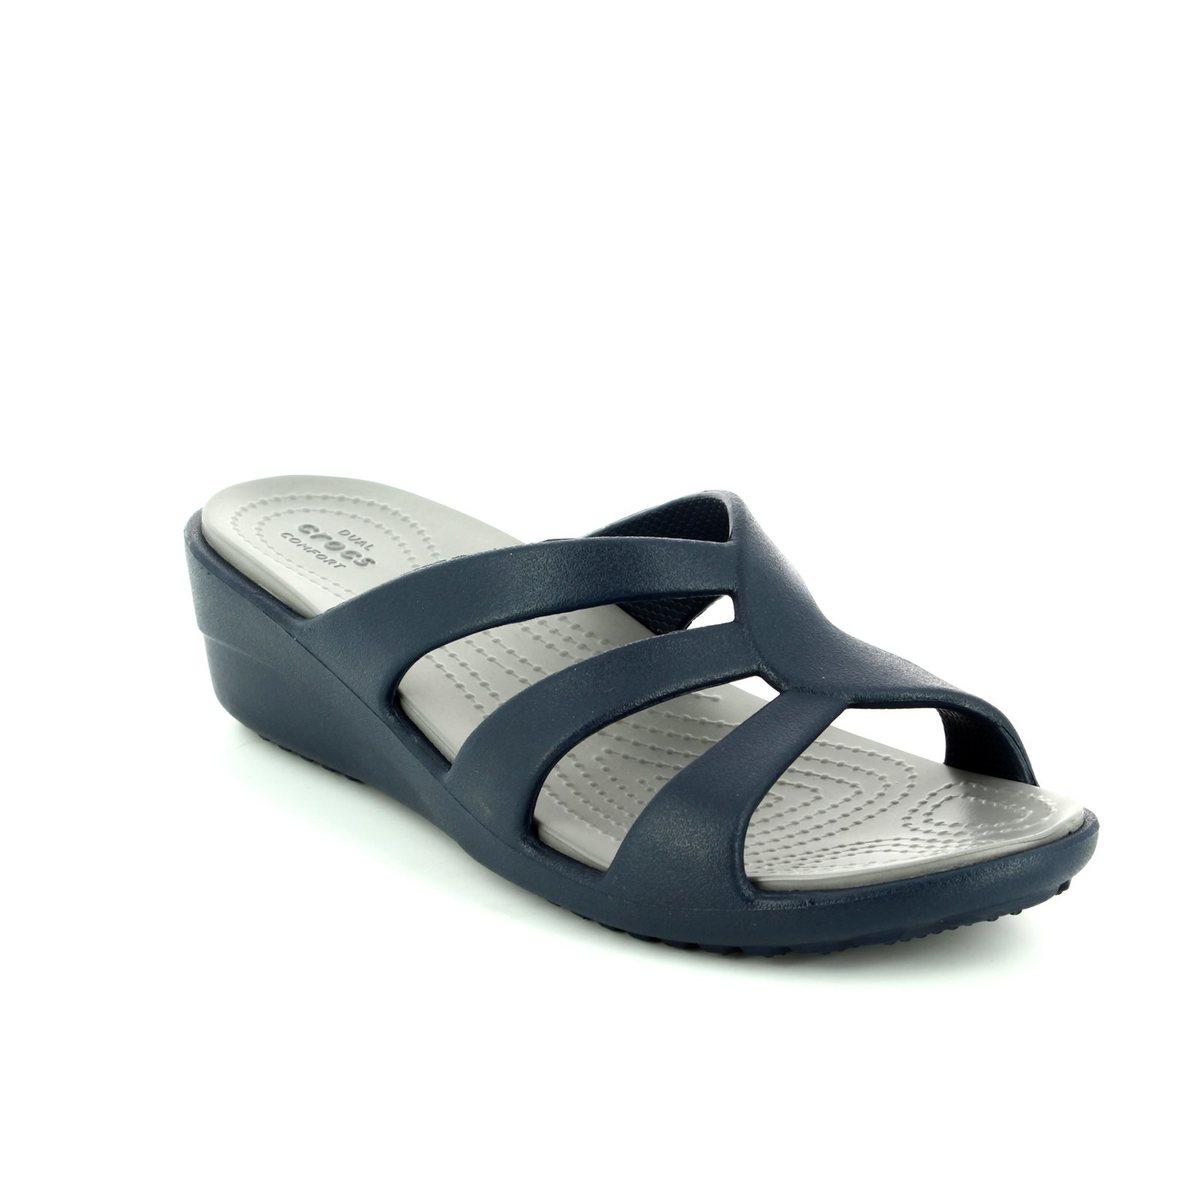 a632ff62c869 Crocs sandals navy u sanrah strappy jpg 1200x1200 Crocs sanrah